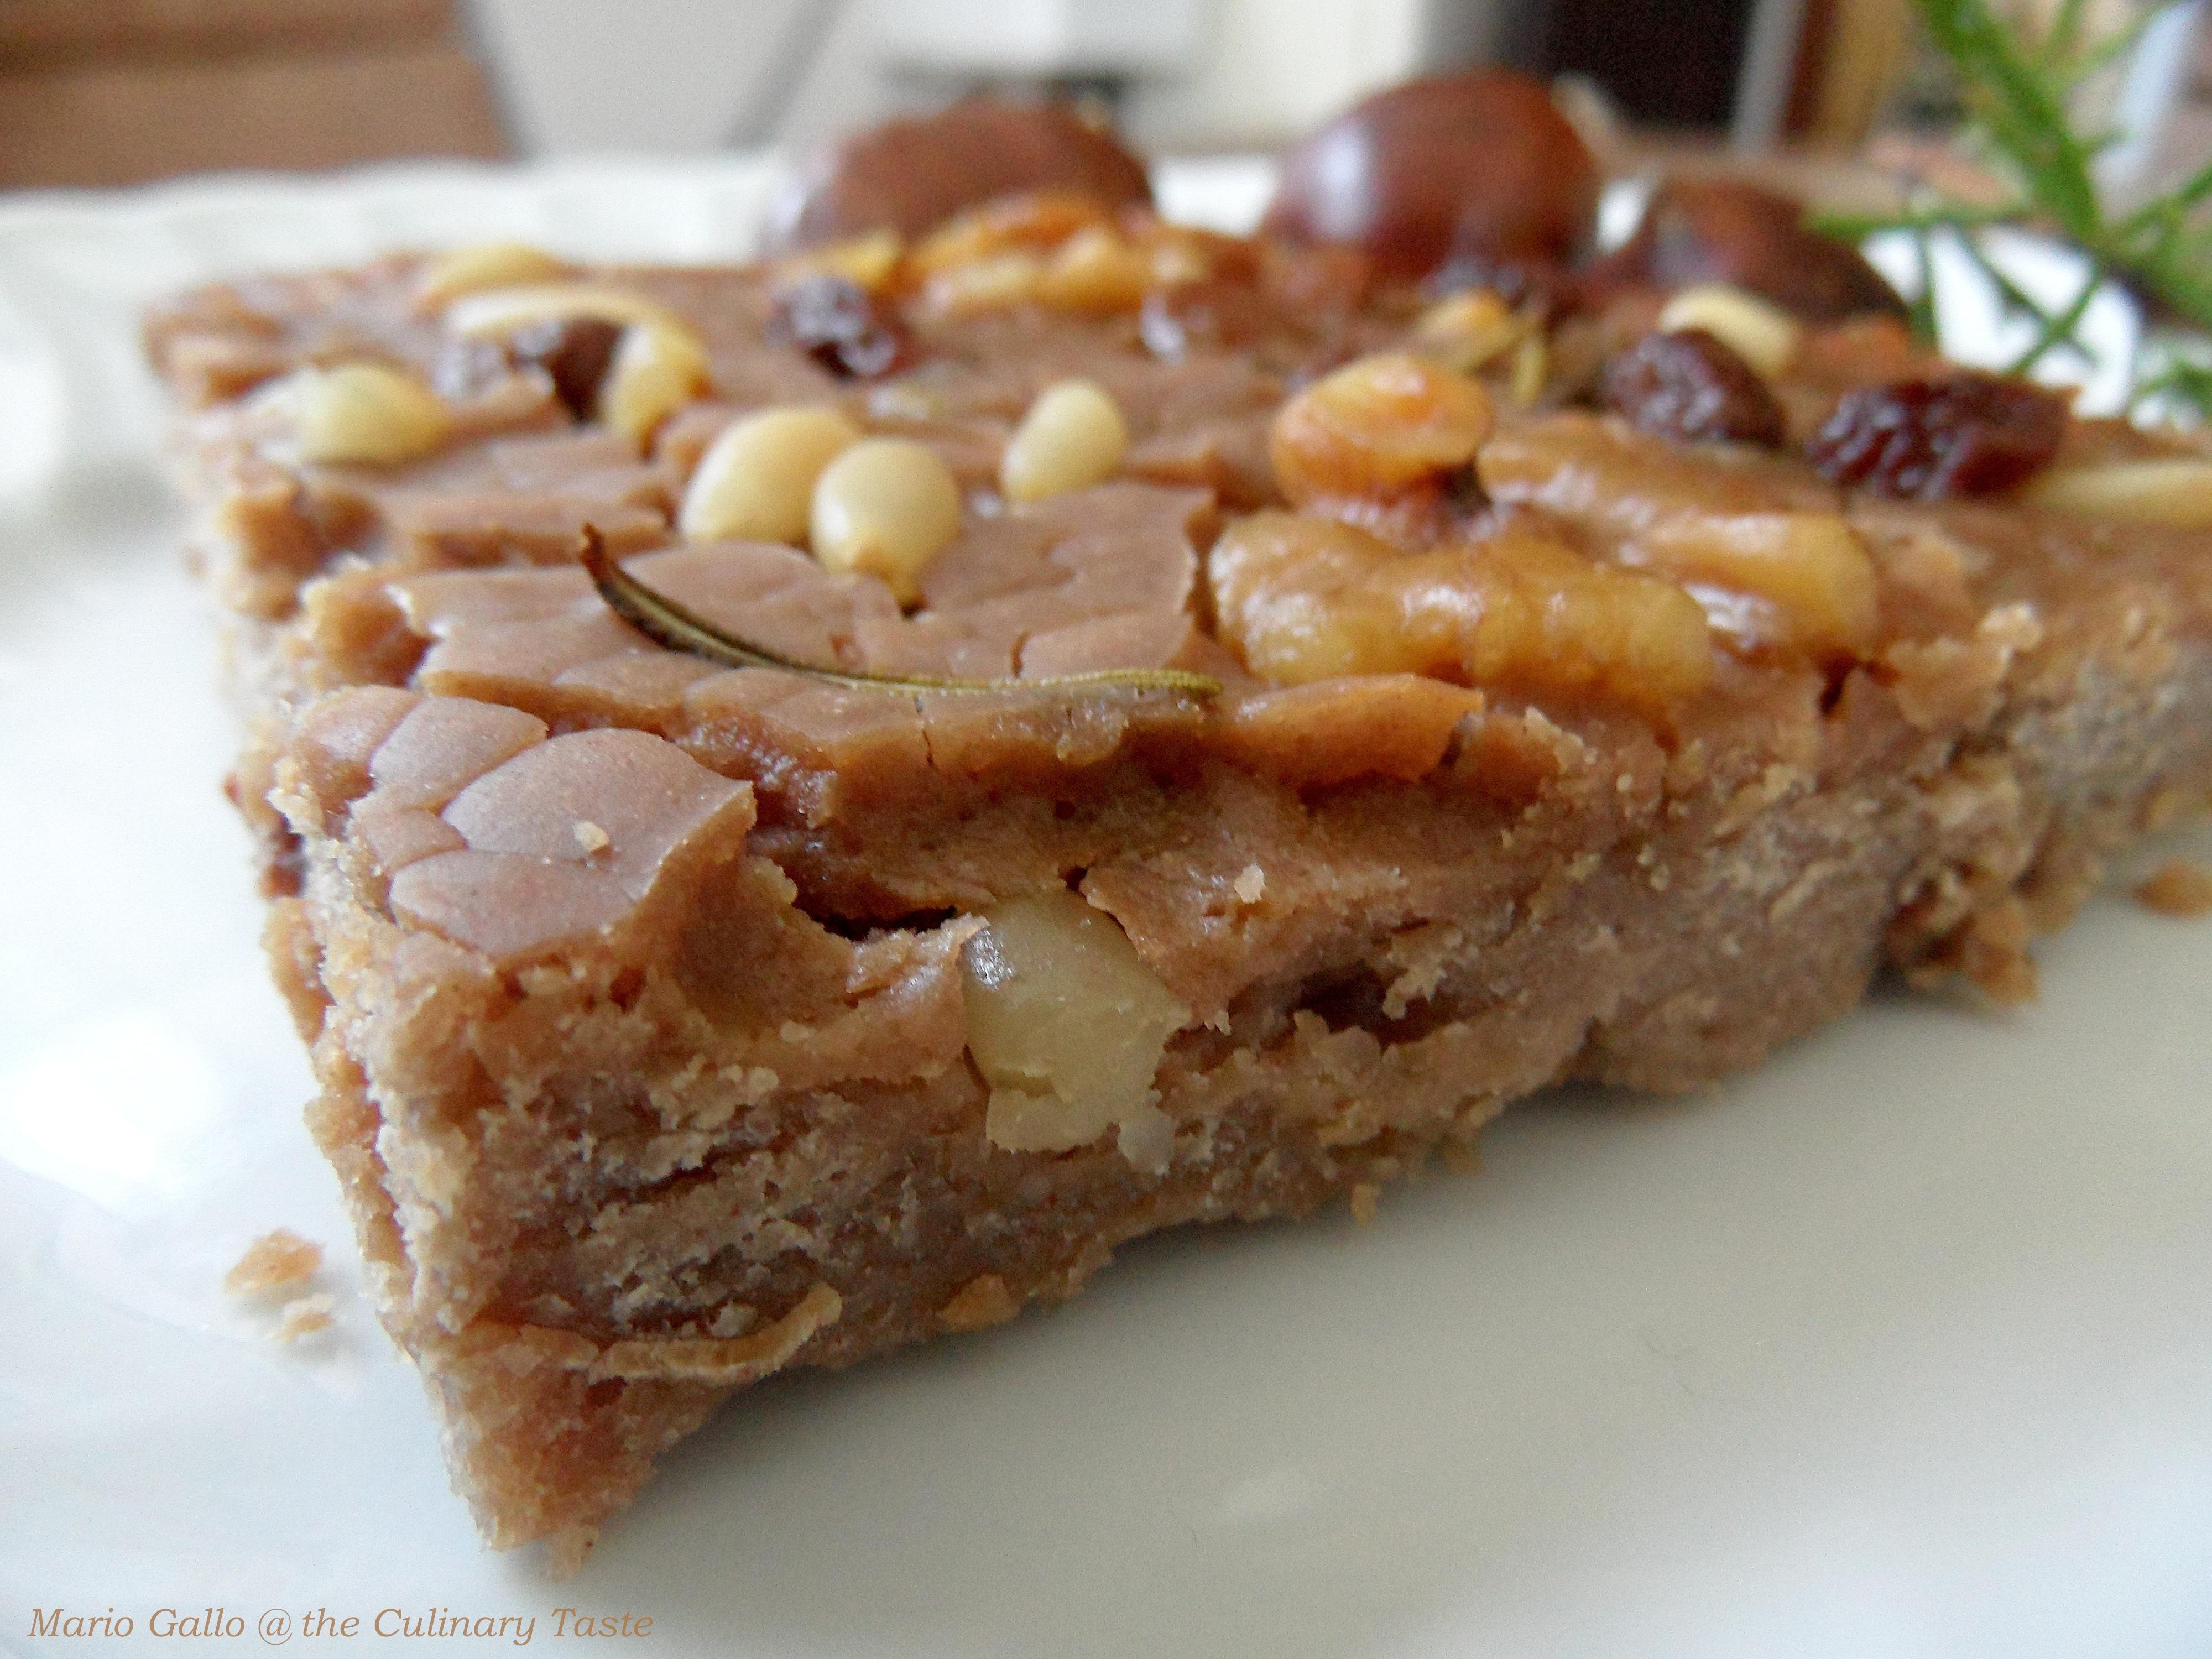 Gluten Free Vegan Wedding Cake Recipe